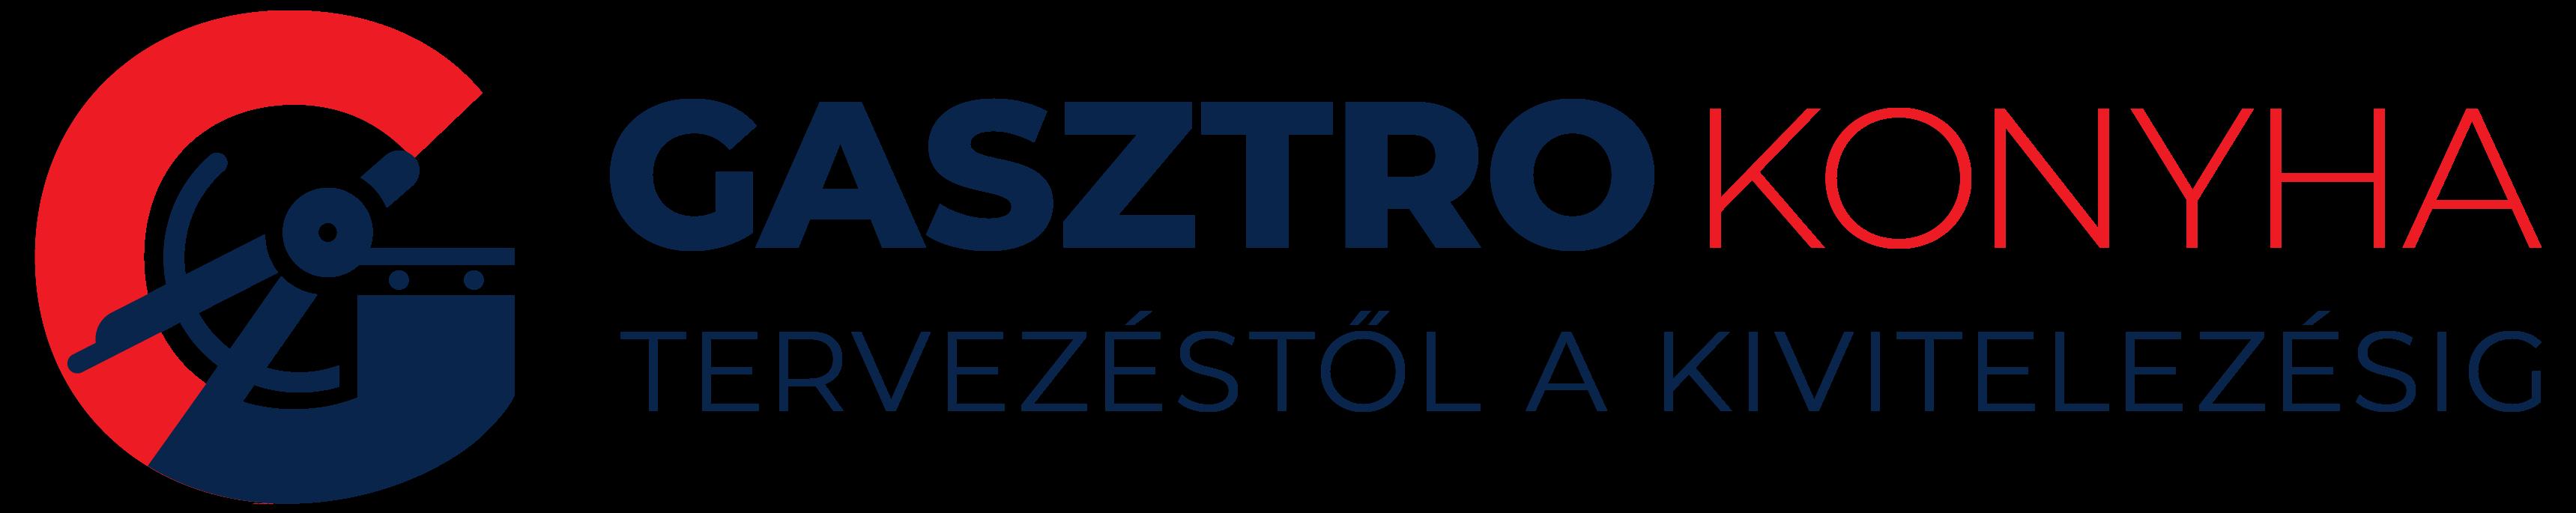 Gasztro_Konyha_logo-03